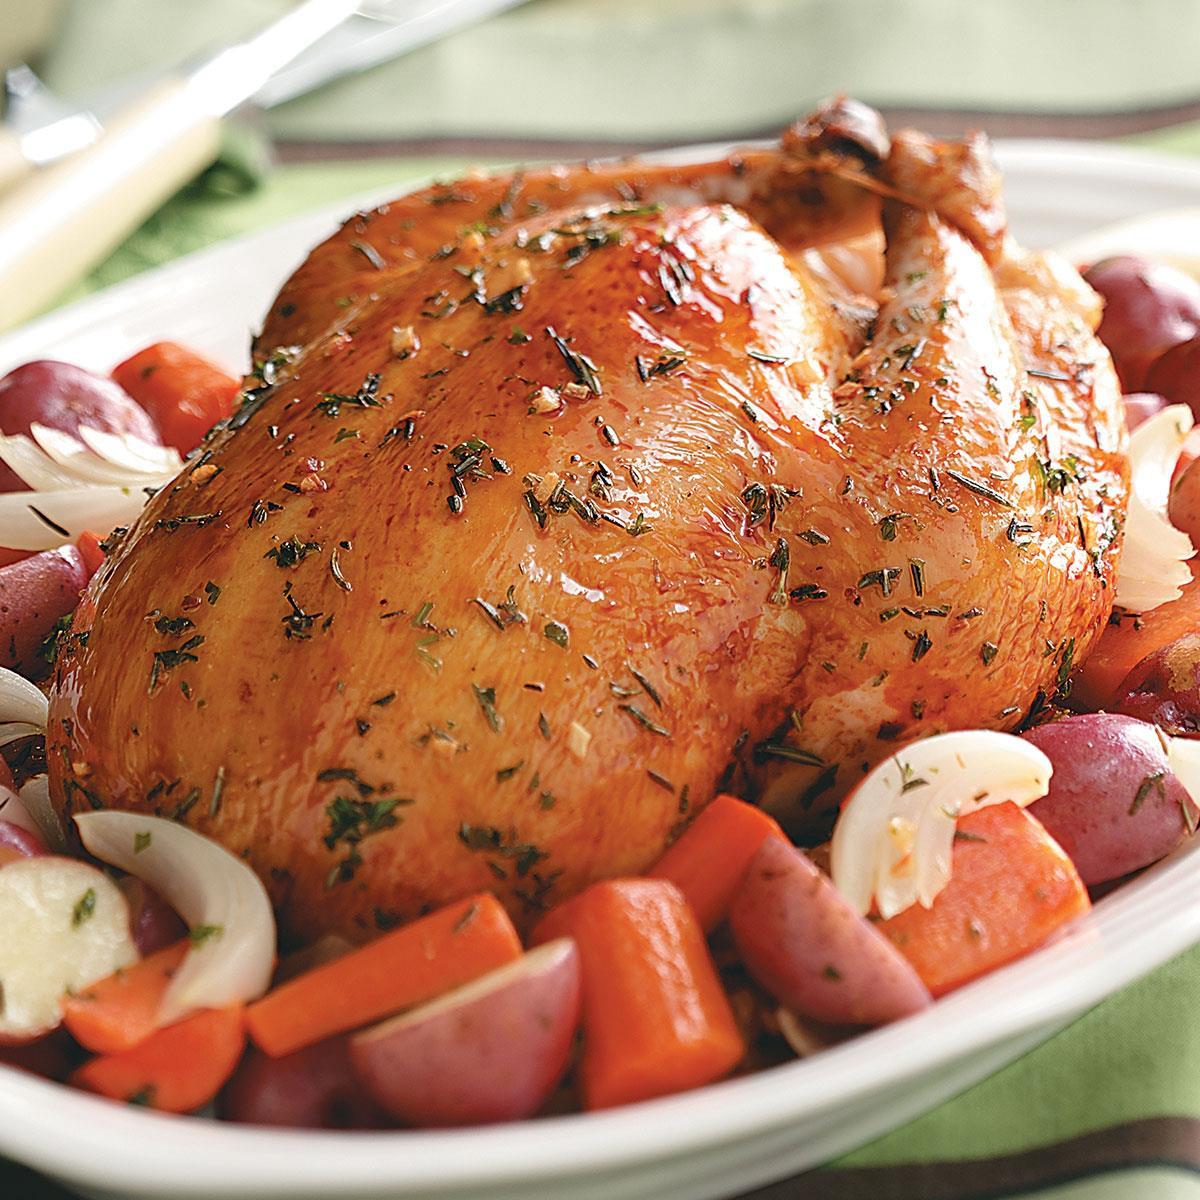 Baked Rosemary Chicken  Roasted Chicken with Rosemary Recipe